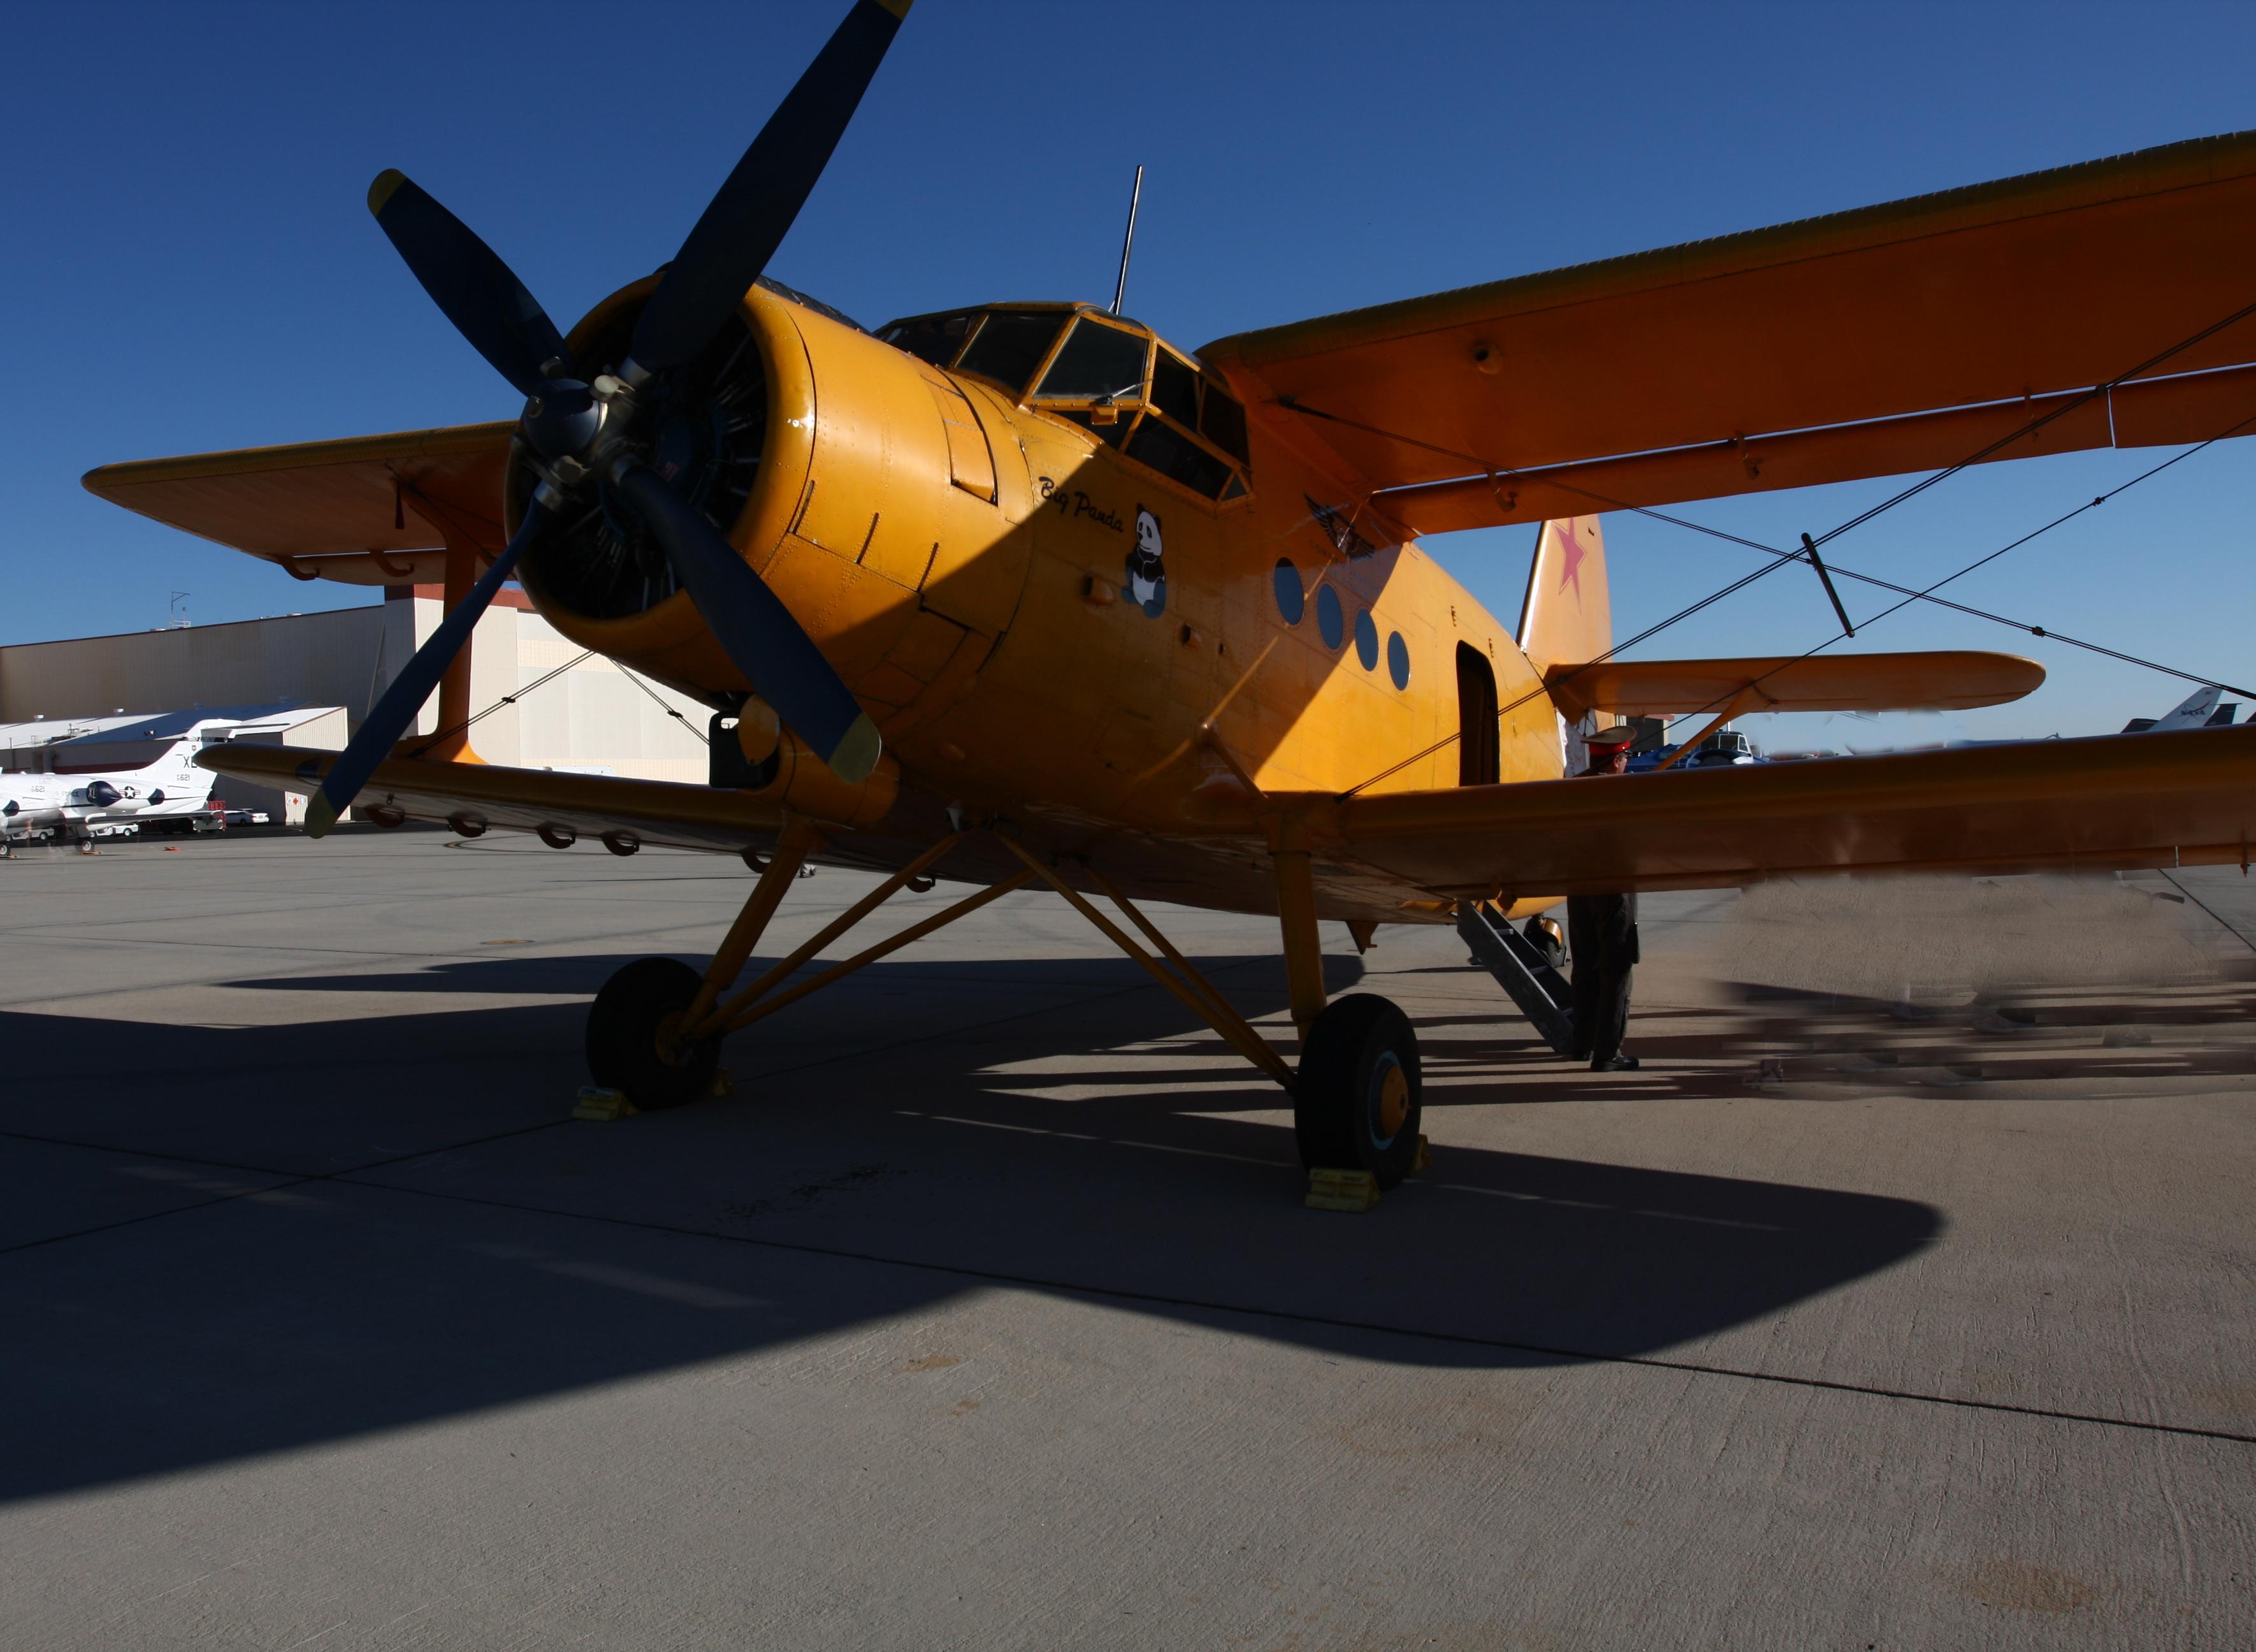 File:Antonov An-2 Colt (4022528572).jpg